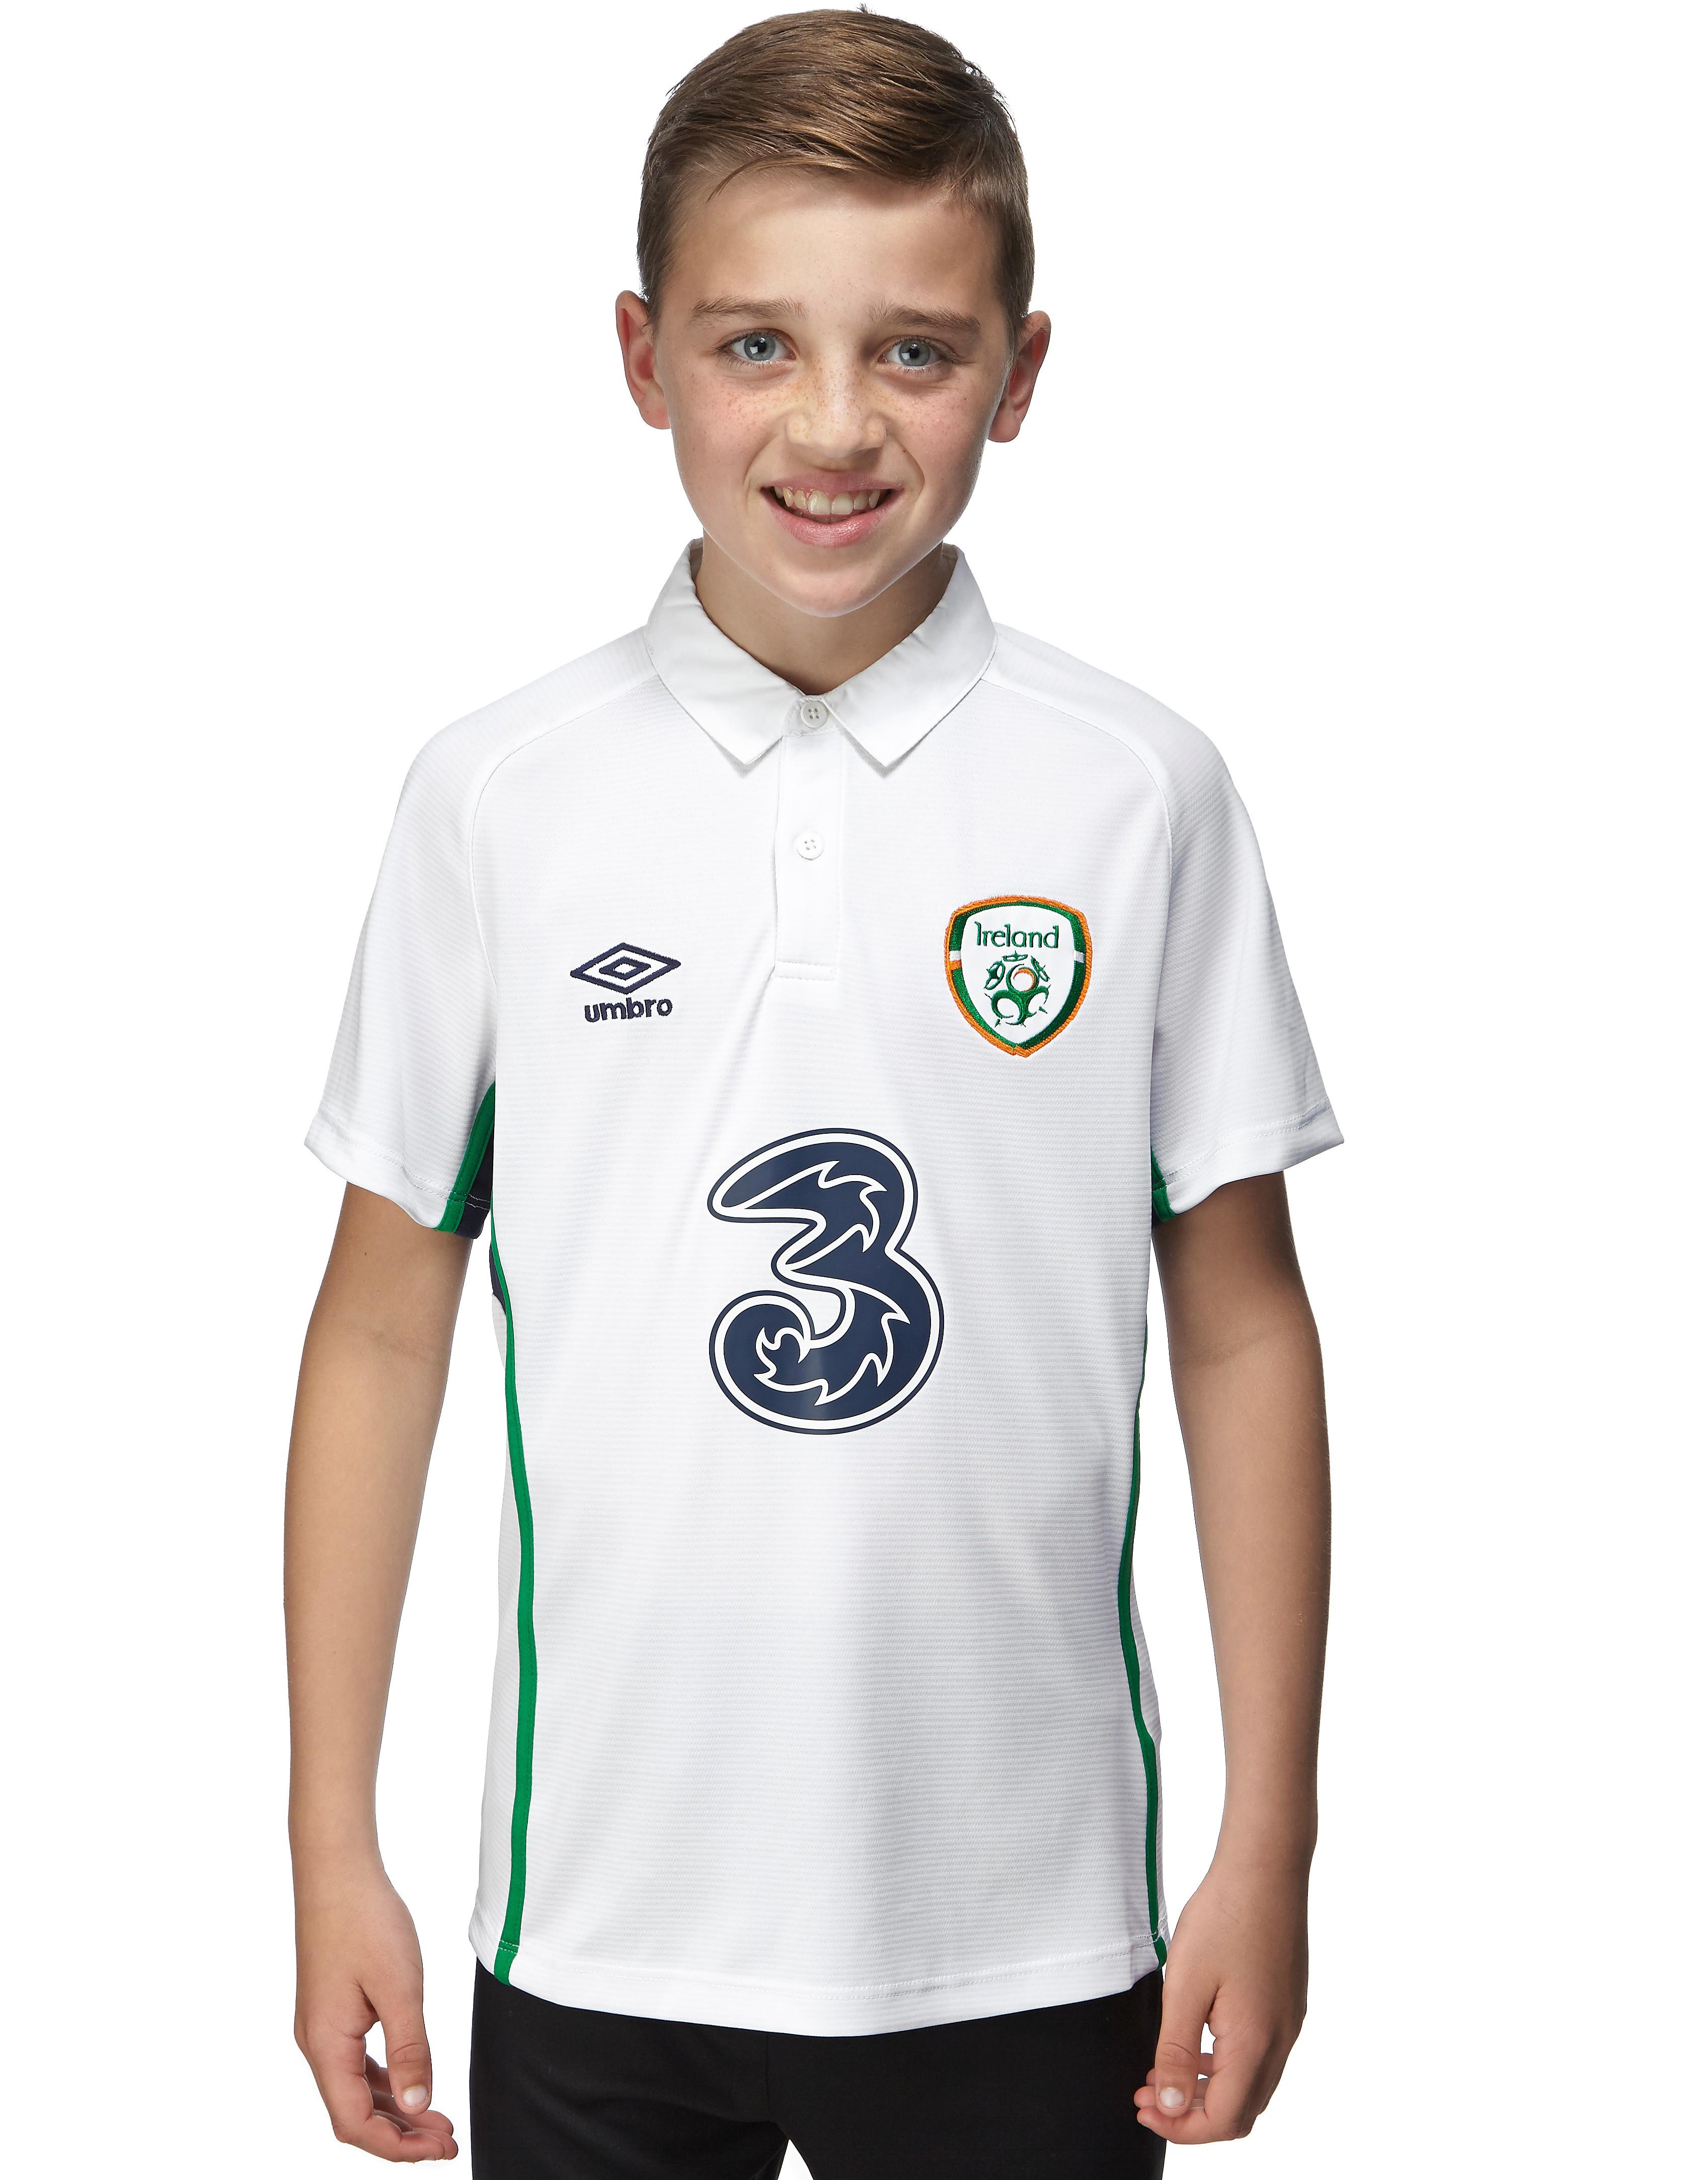 Umbro Republic of Ireland 2014 Away Shirt Junior